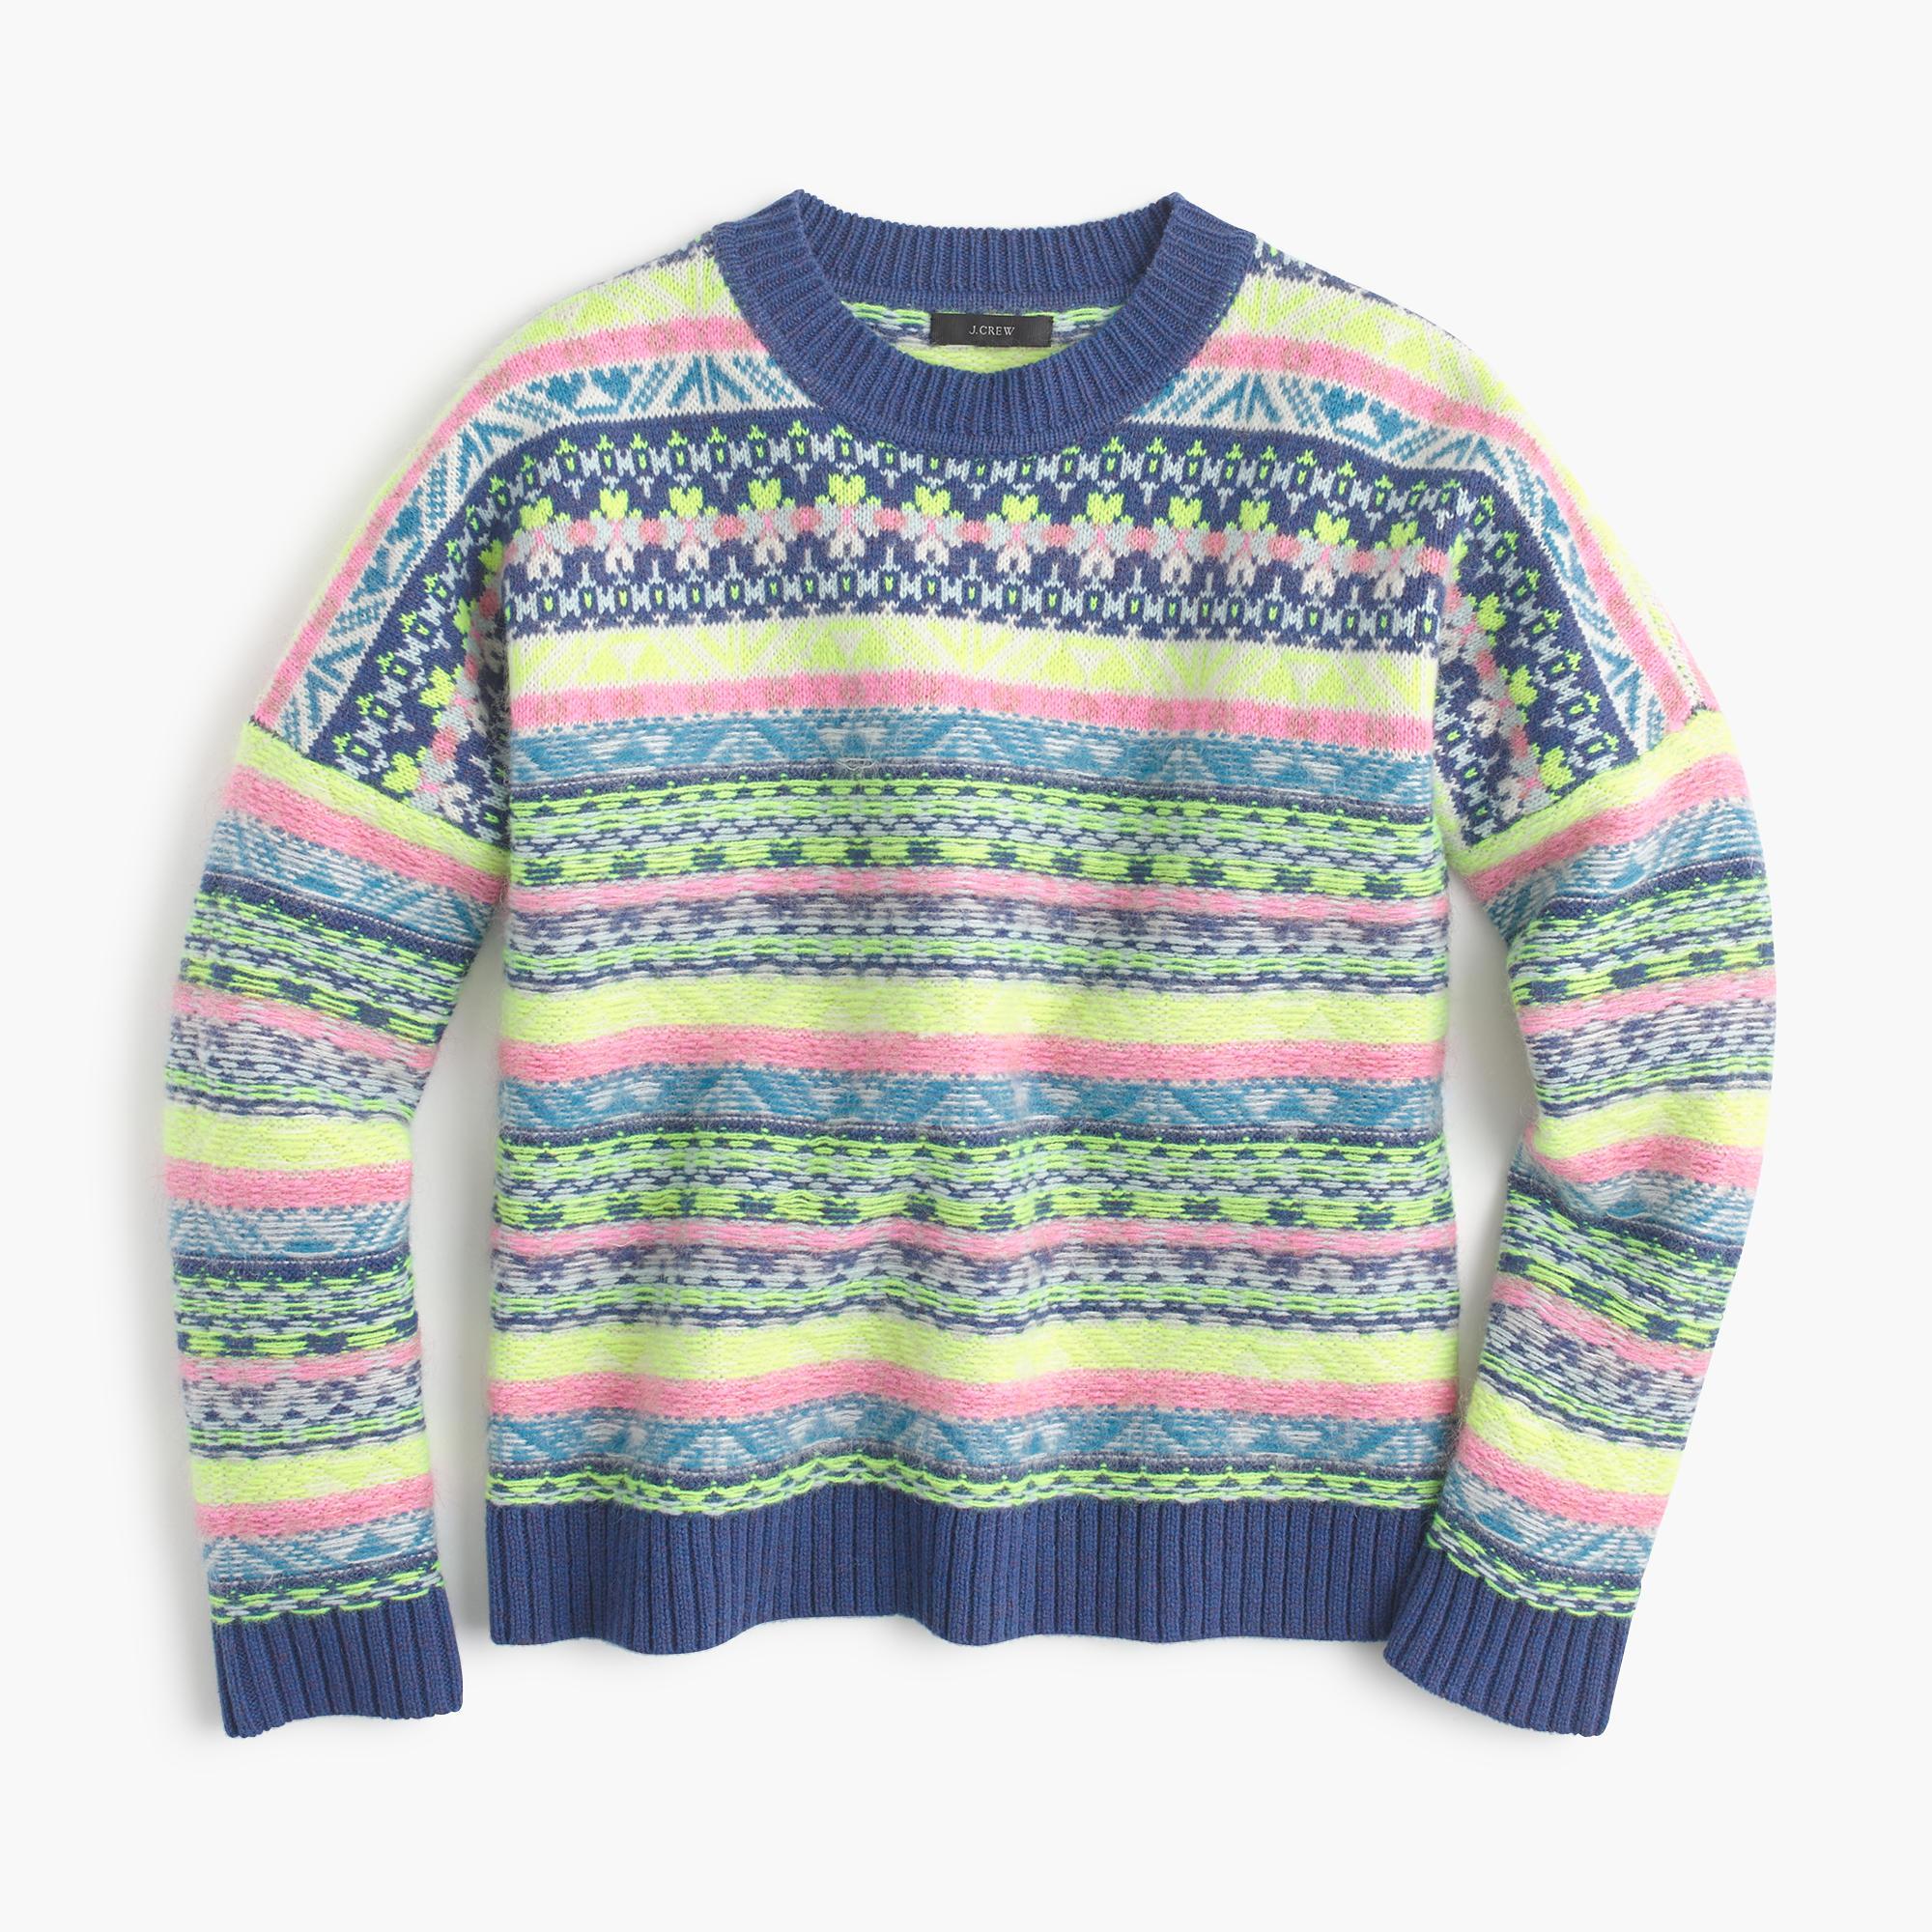 J.Crew Fair Isle Crewneck Sweater - Lyst 394465117c